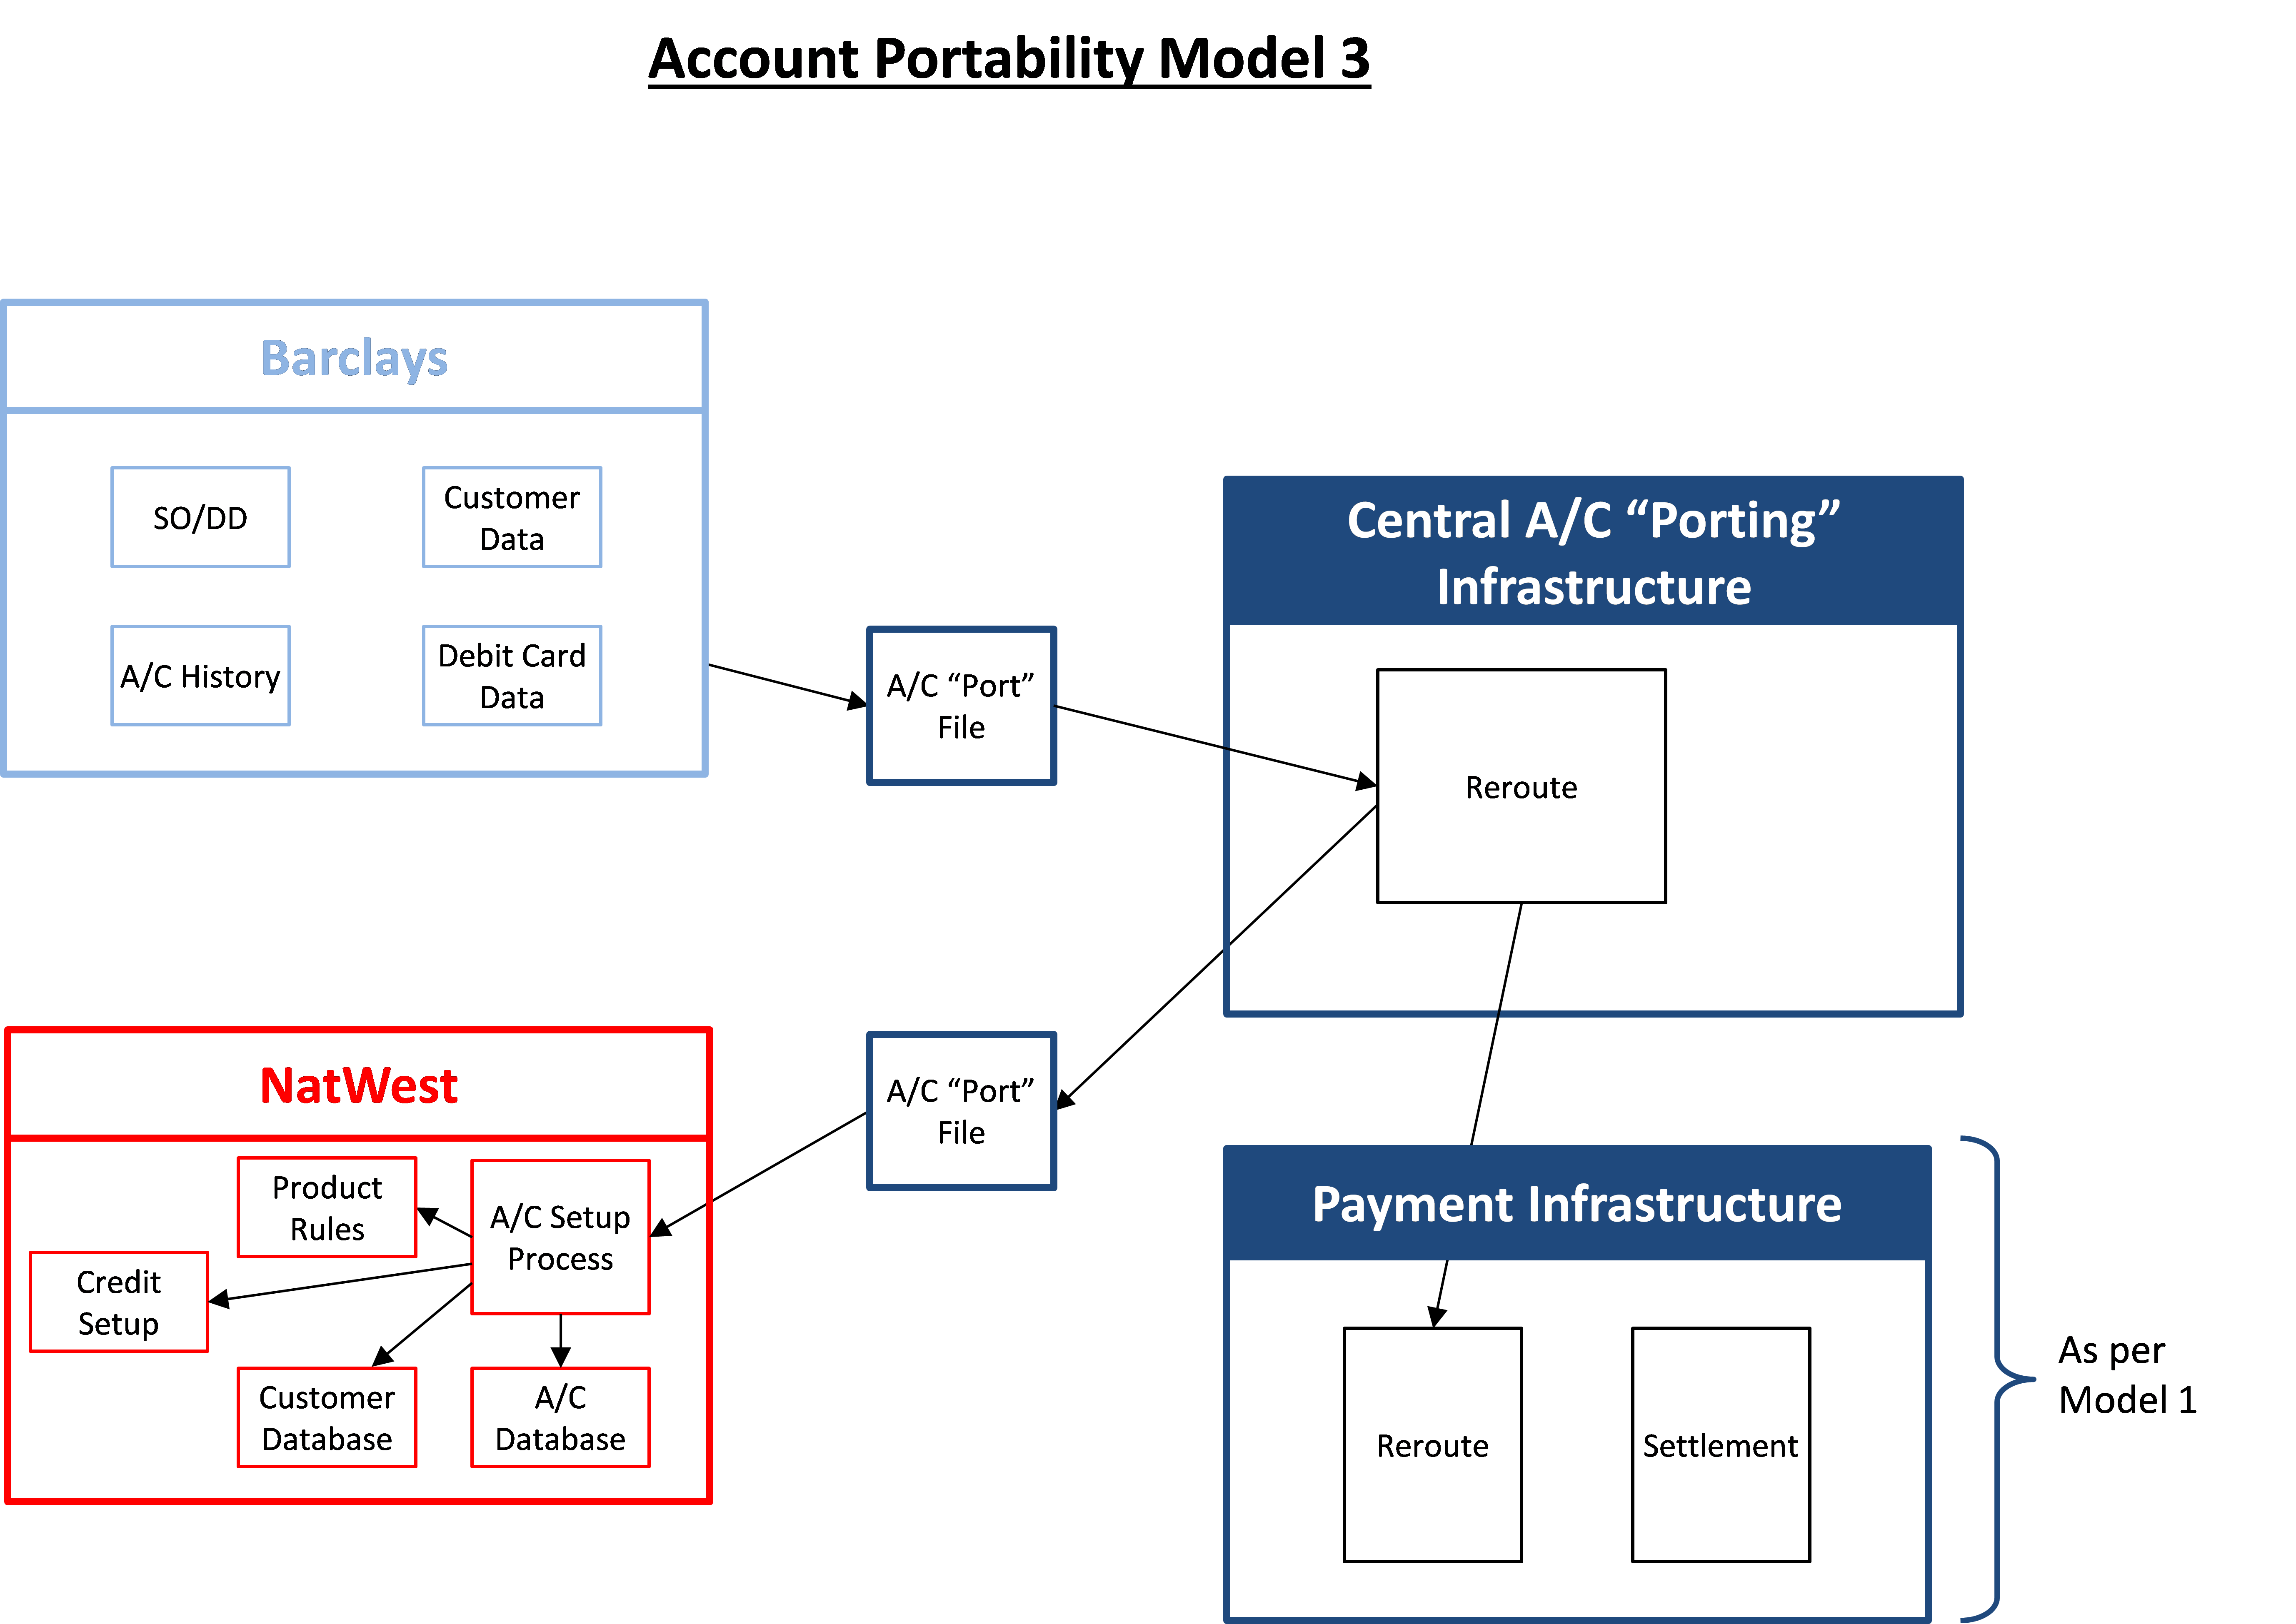 Account Portability Model 3